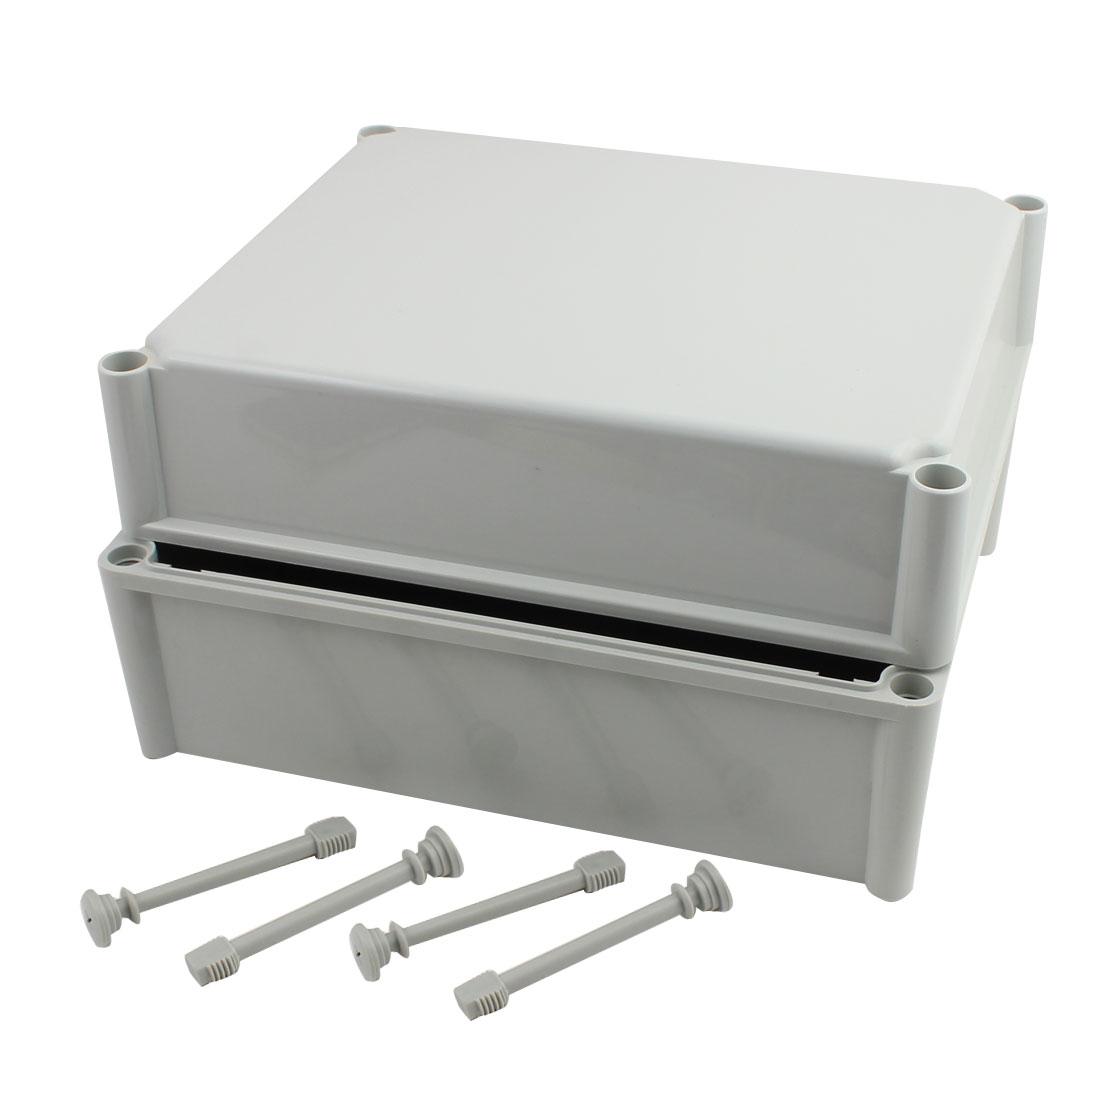 340mm x 280mm x 180mm Dustproof IP65 Junction Box DIY Case Enclosure Gray